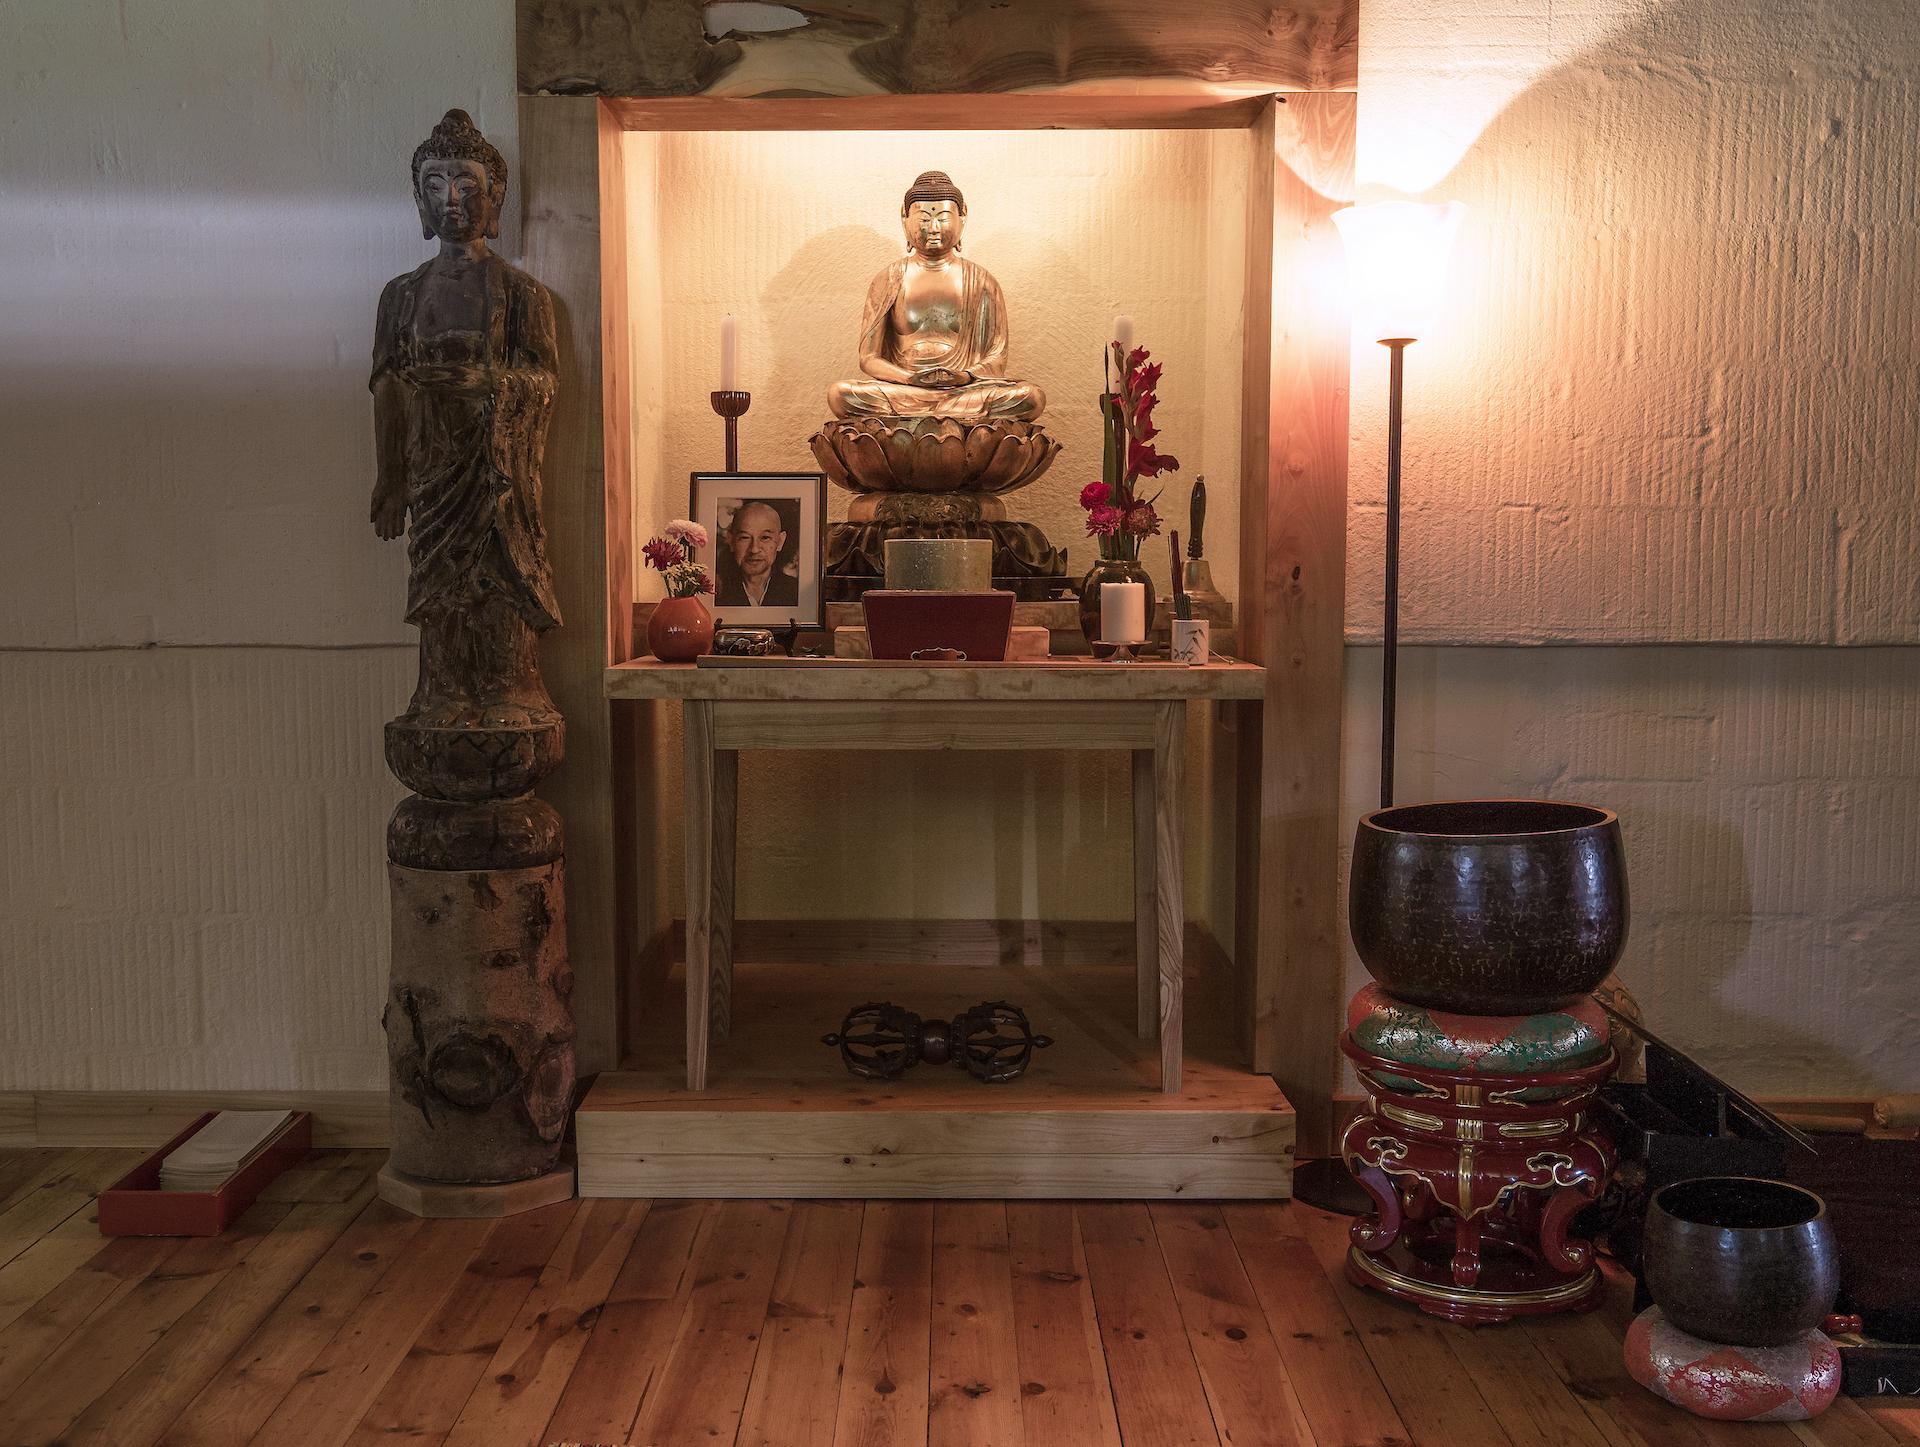 zen zazen meditation johanneshof hotzenhaus dharma sangha baker roshi buddhismus Altar Buddha Halle Shunryo Suzuki Roshi